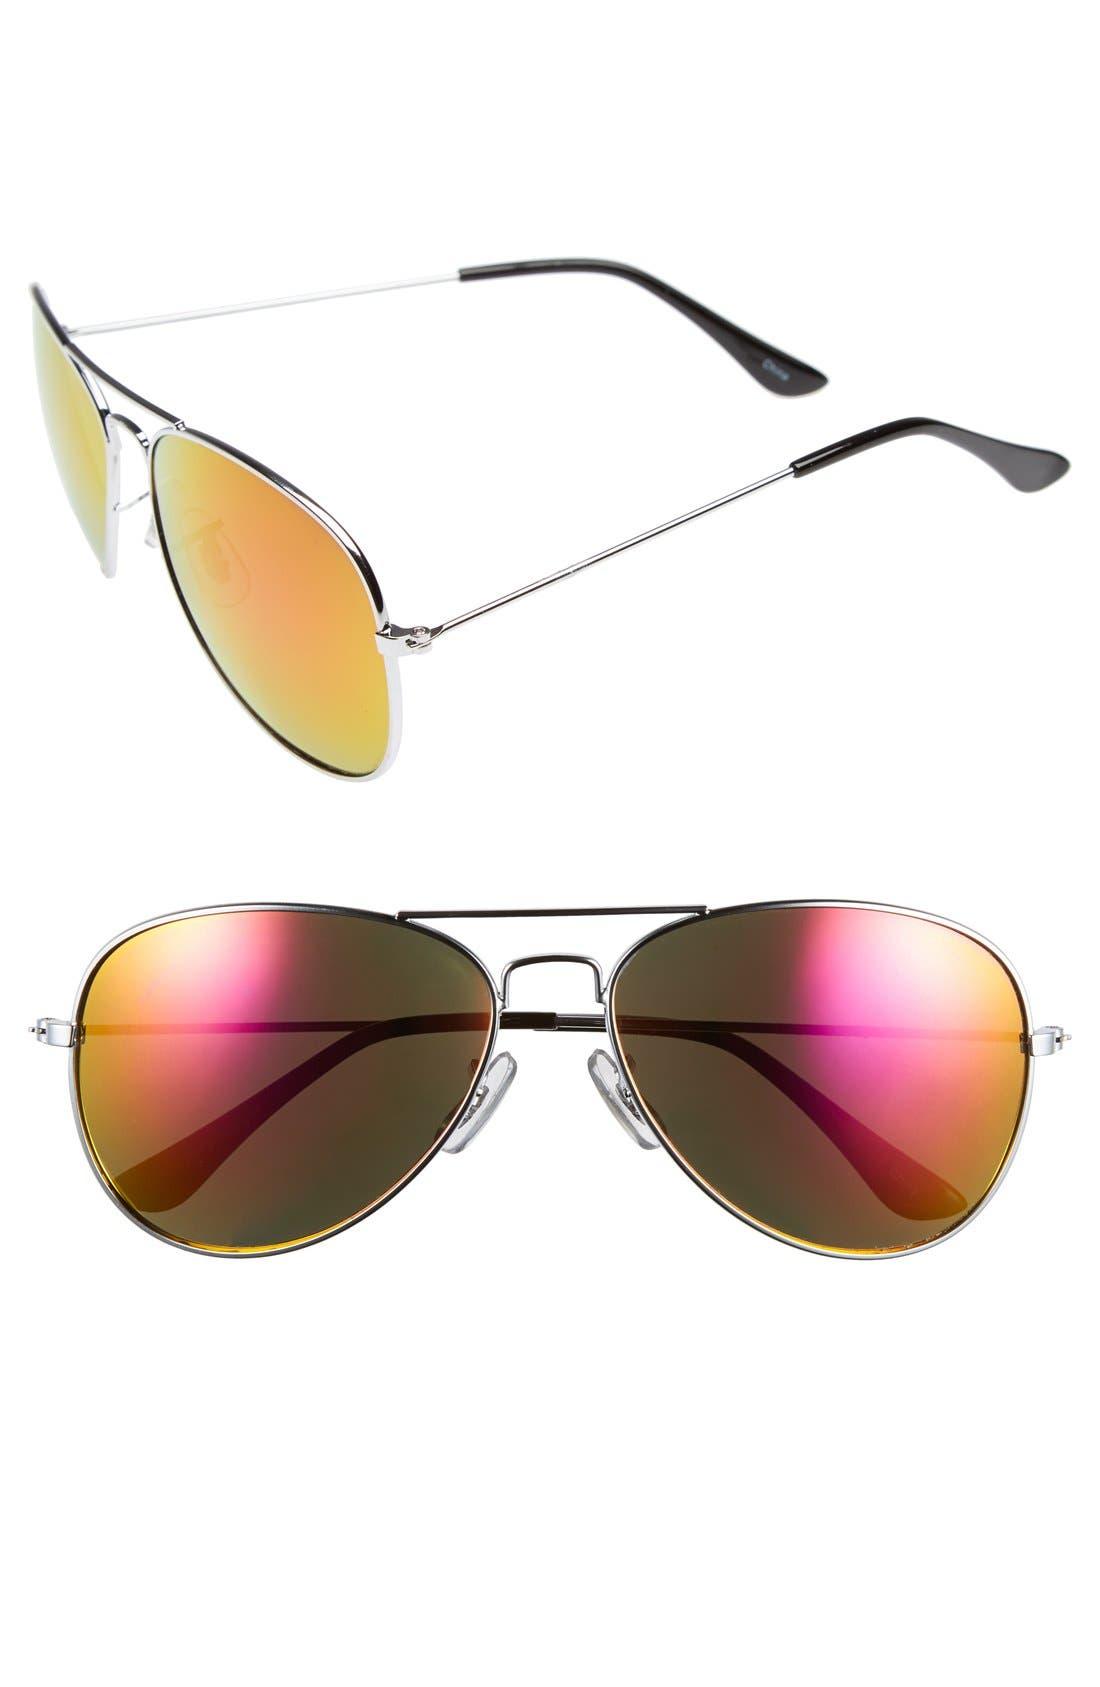 55mm Mirrored Aviator Sunglasses,                         Main,                         color, Silver/ Yellow